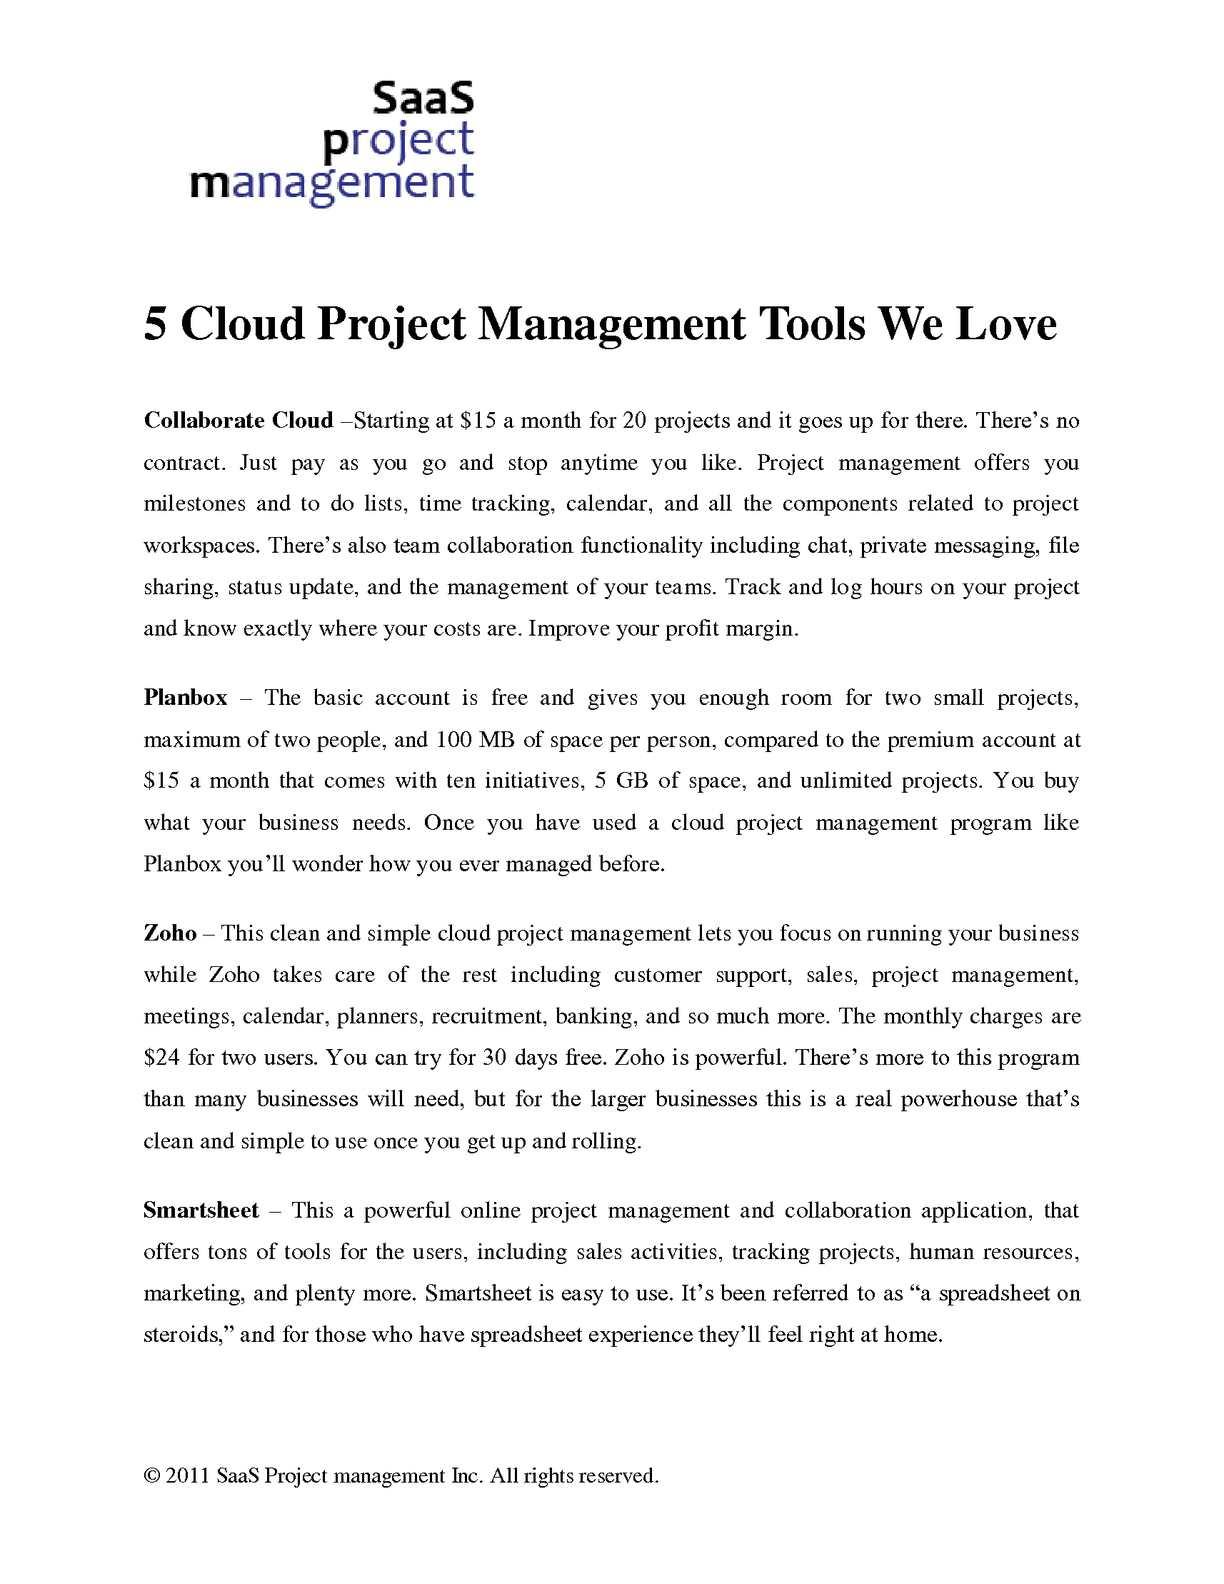 Calamo 5 Cloud Project Management Tools We Love